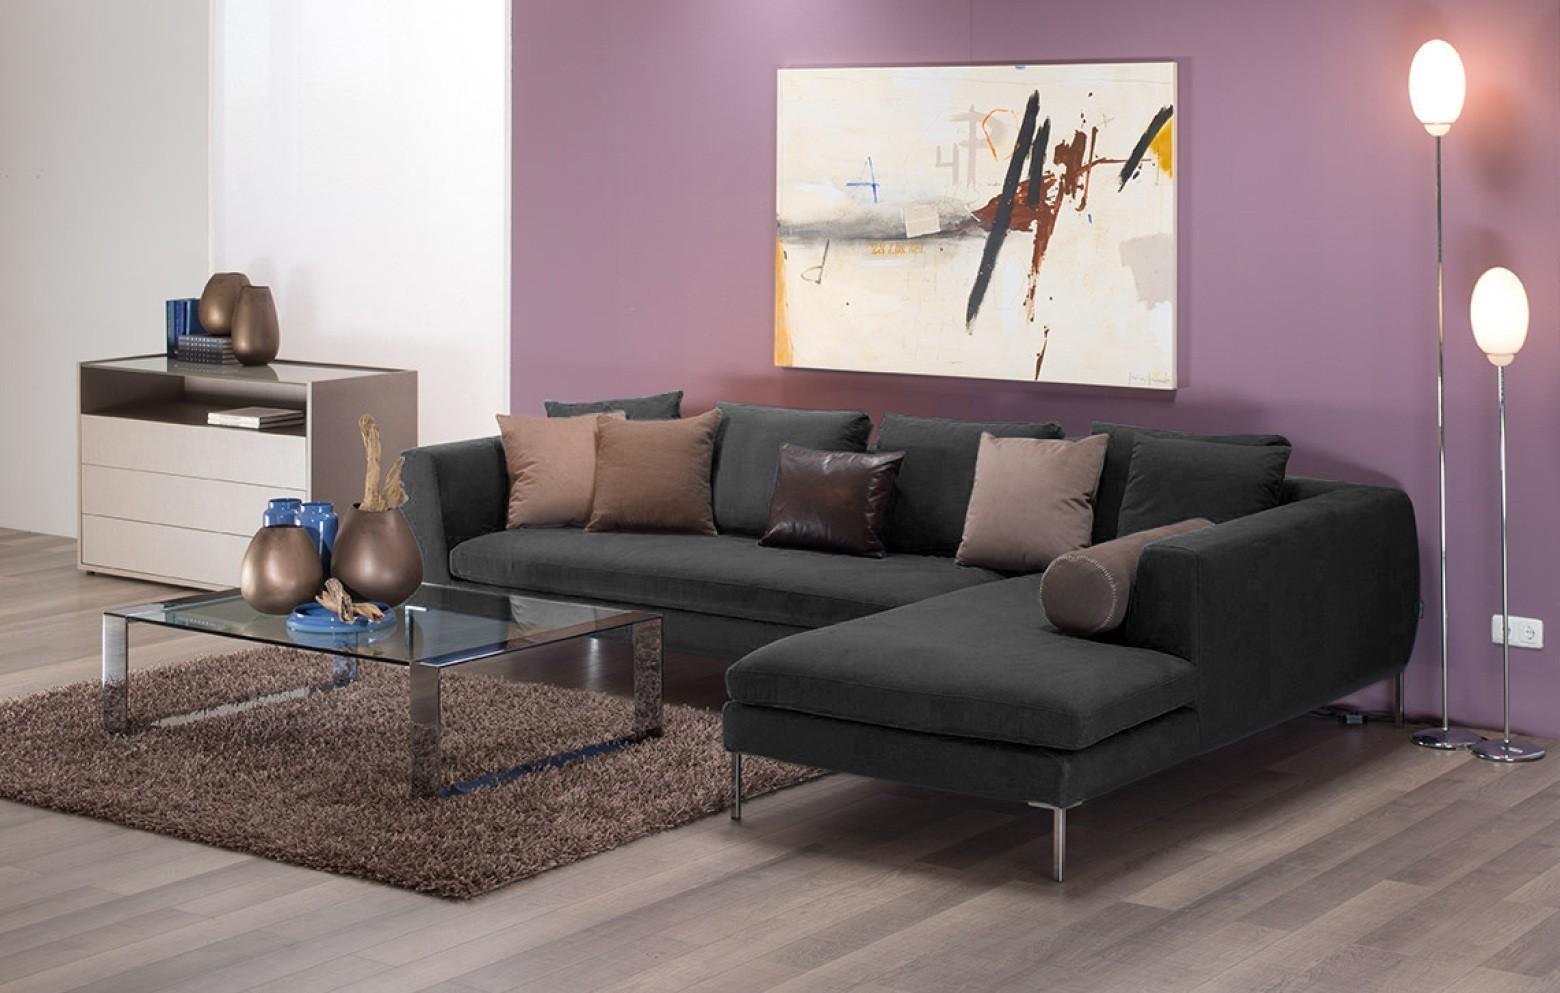 New bristol ecksofa sofas online outlet who 39 s perfect for Ecksofa design outlet